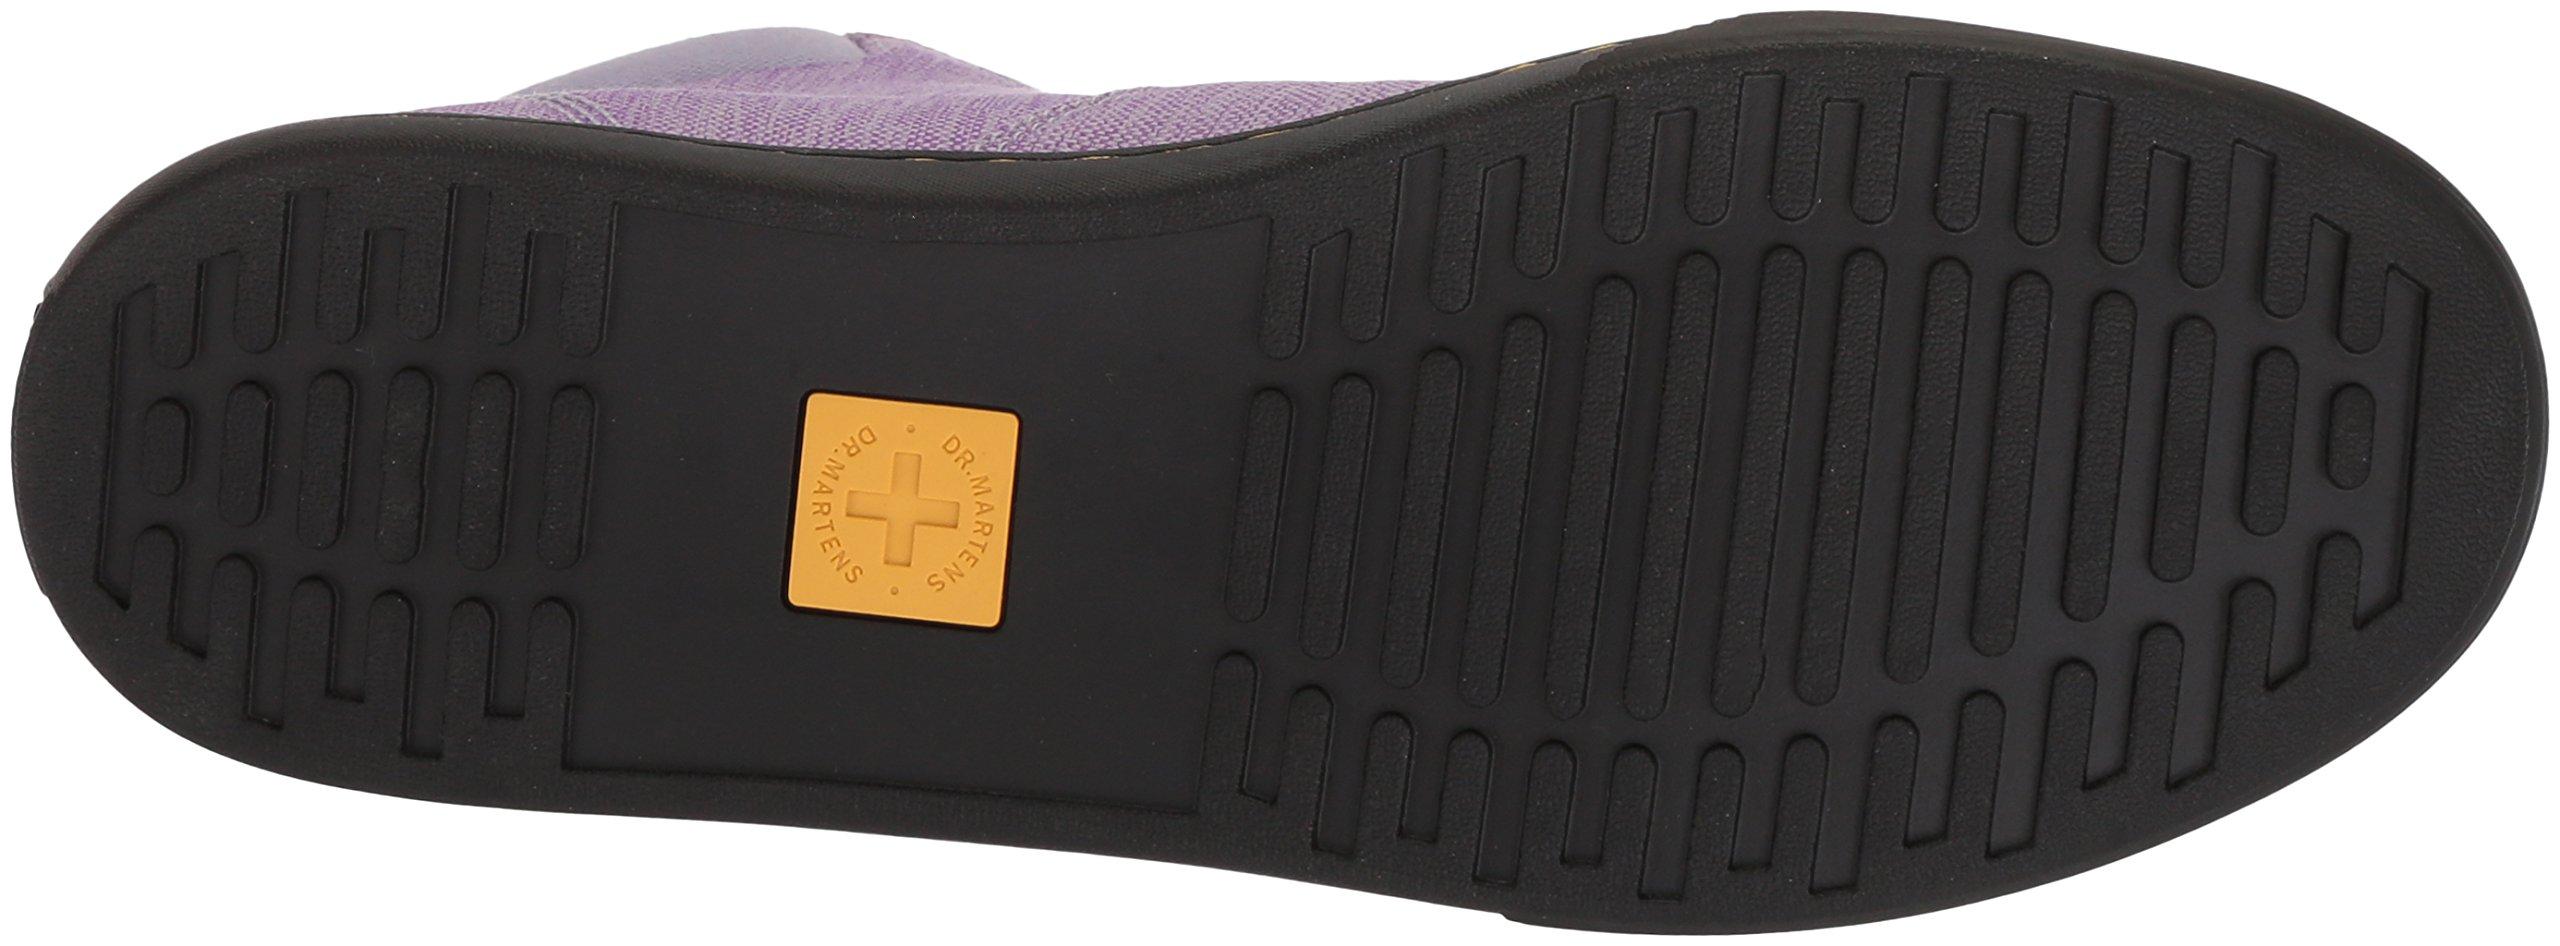 Dr. Martens Women's Maegley Fashion Boot, Purple Heather Woven Textile+Fine Canvas, 6 Medium UK (8 US) by Dr. Martens (Image #3)